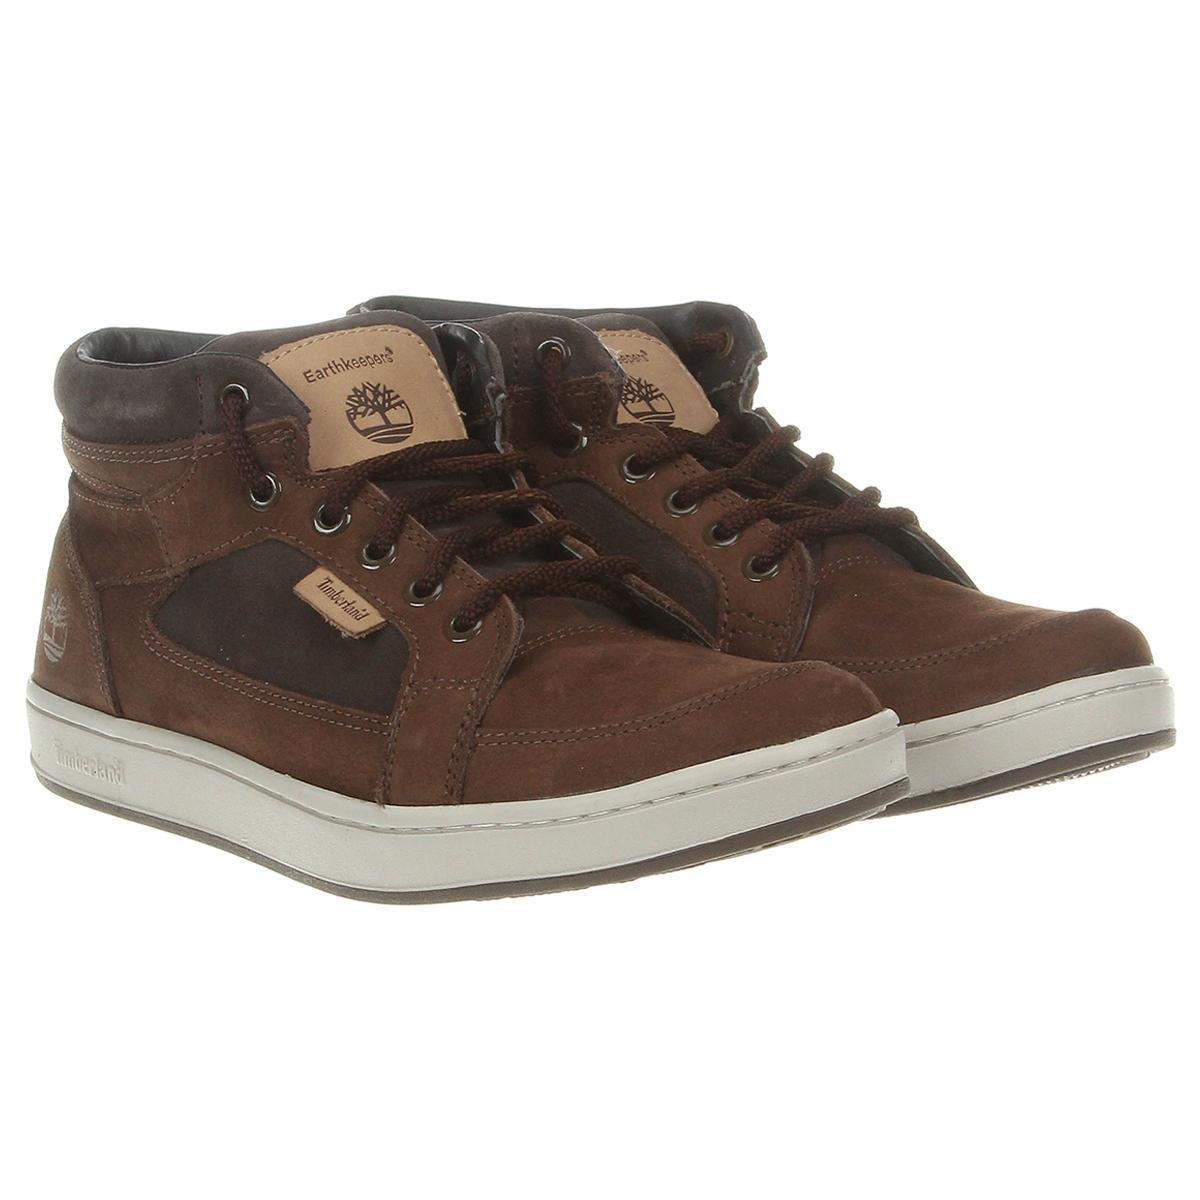 Bota Timberland EK Packer Leather Chukka - Marrom Escuro - Compre ... c14970a622d